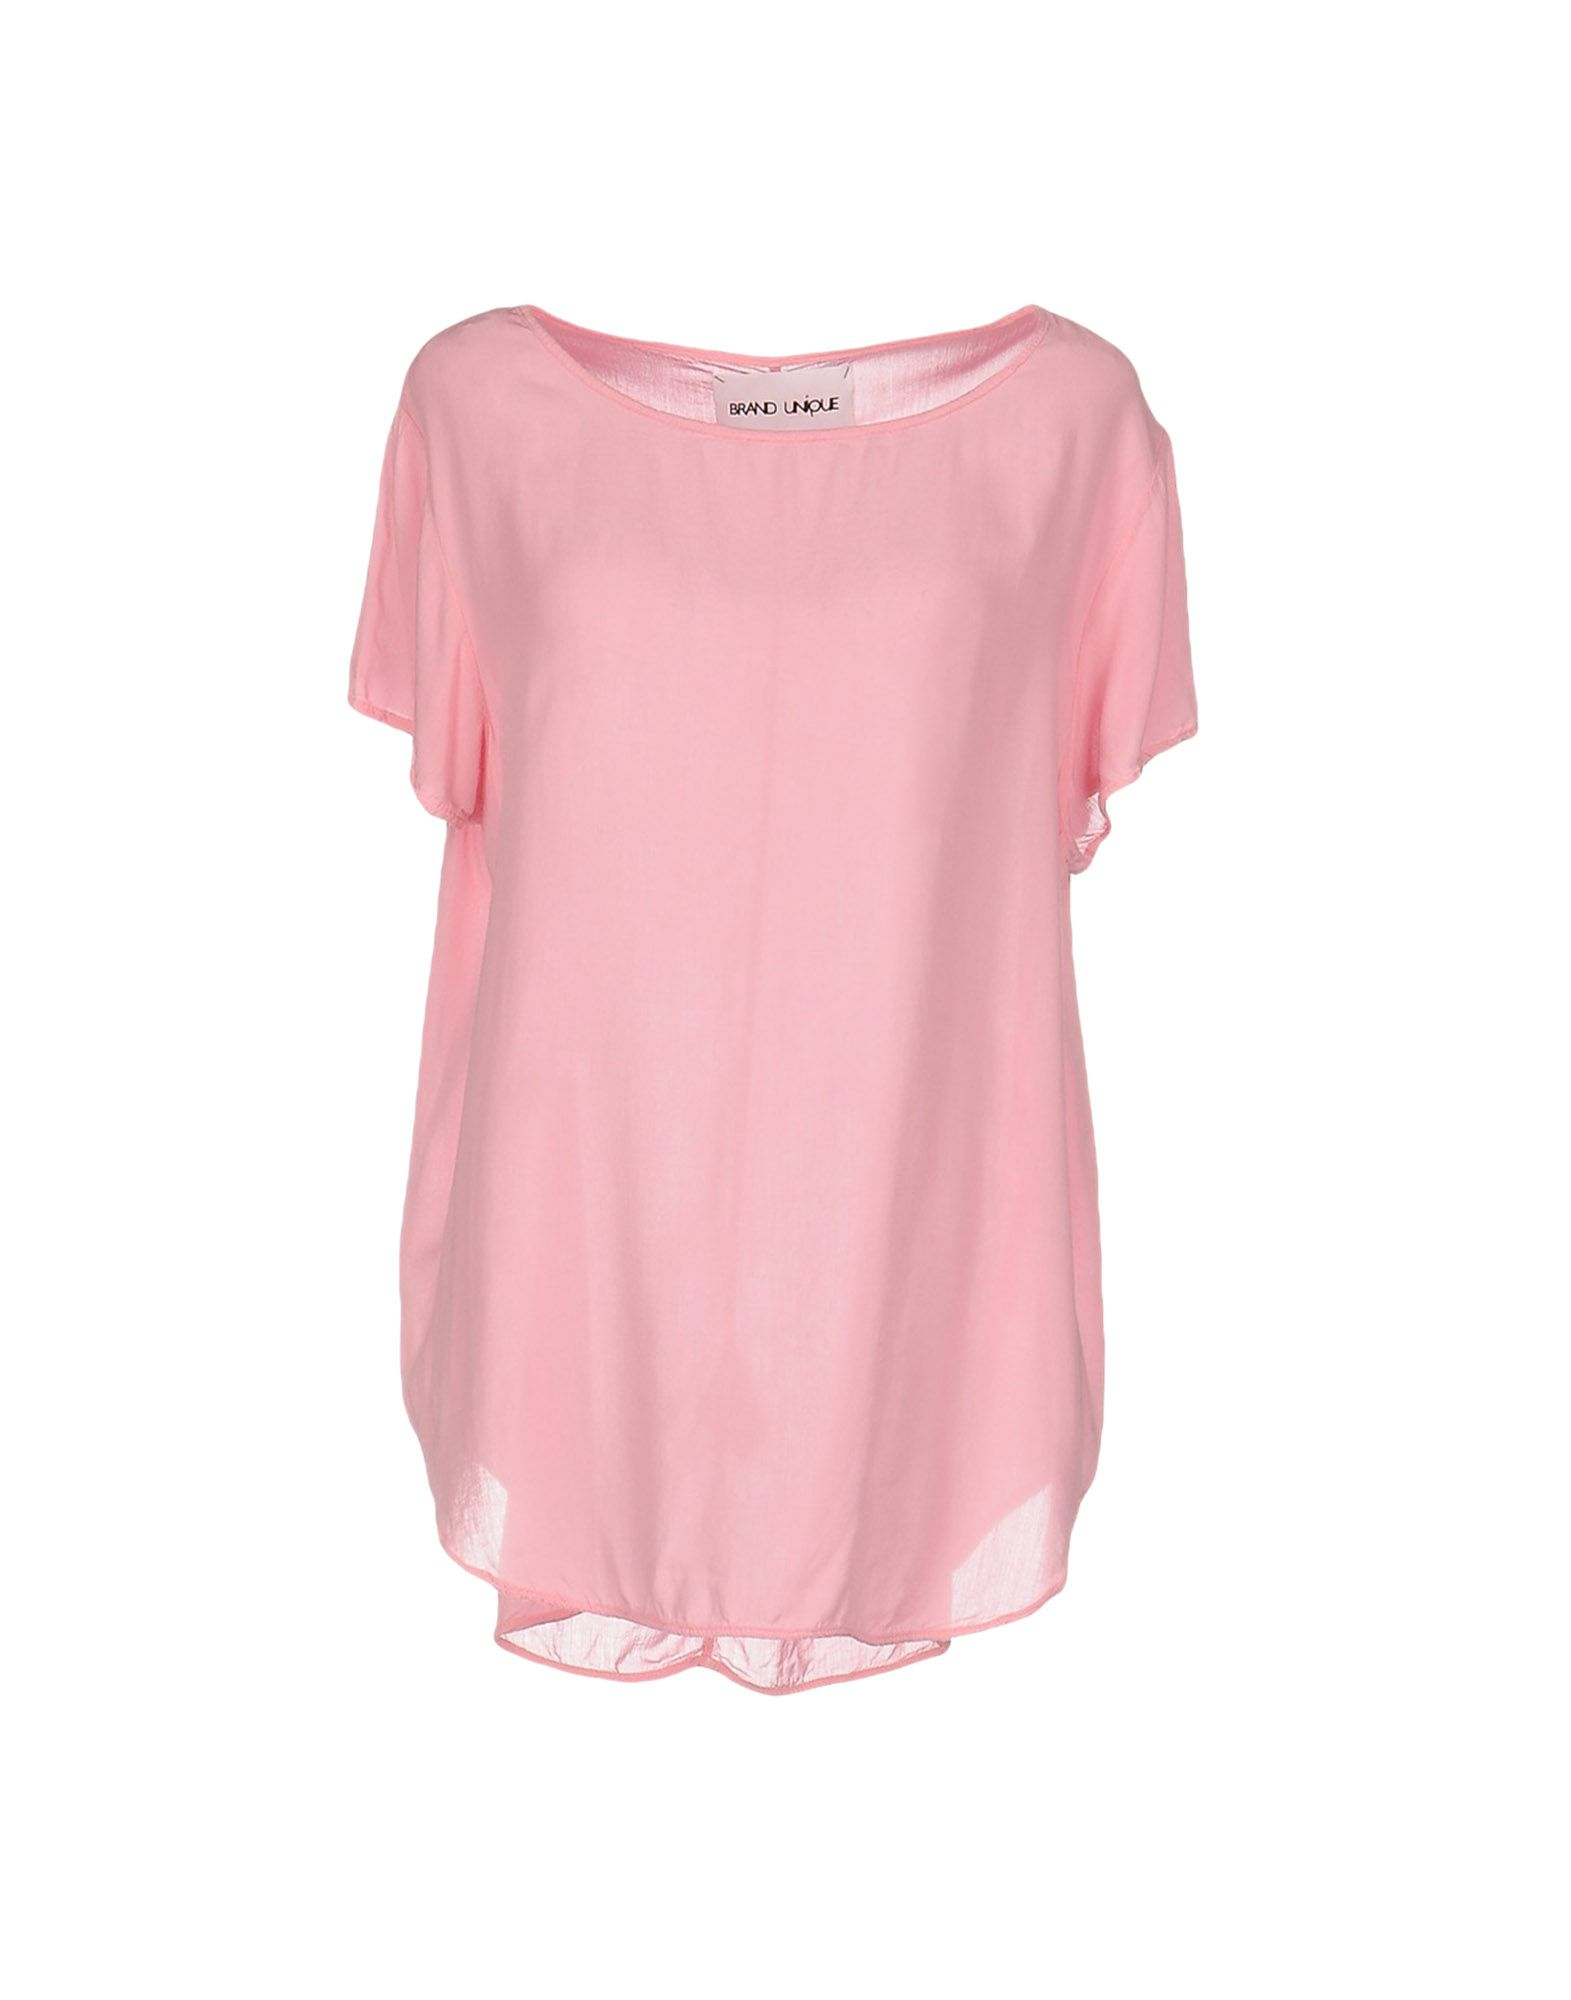 BRAND UNIQUE Блузка markus lupfer футболка с короткими рукавами